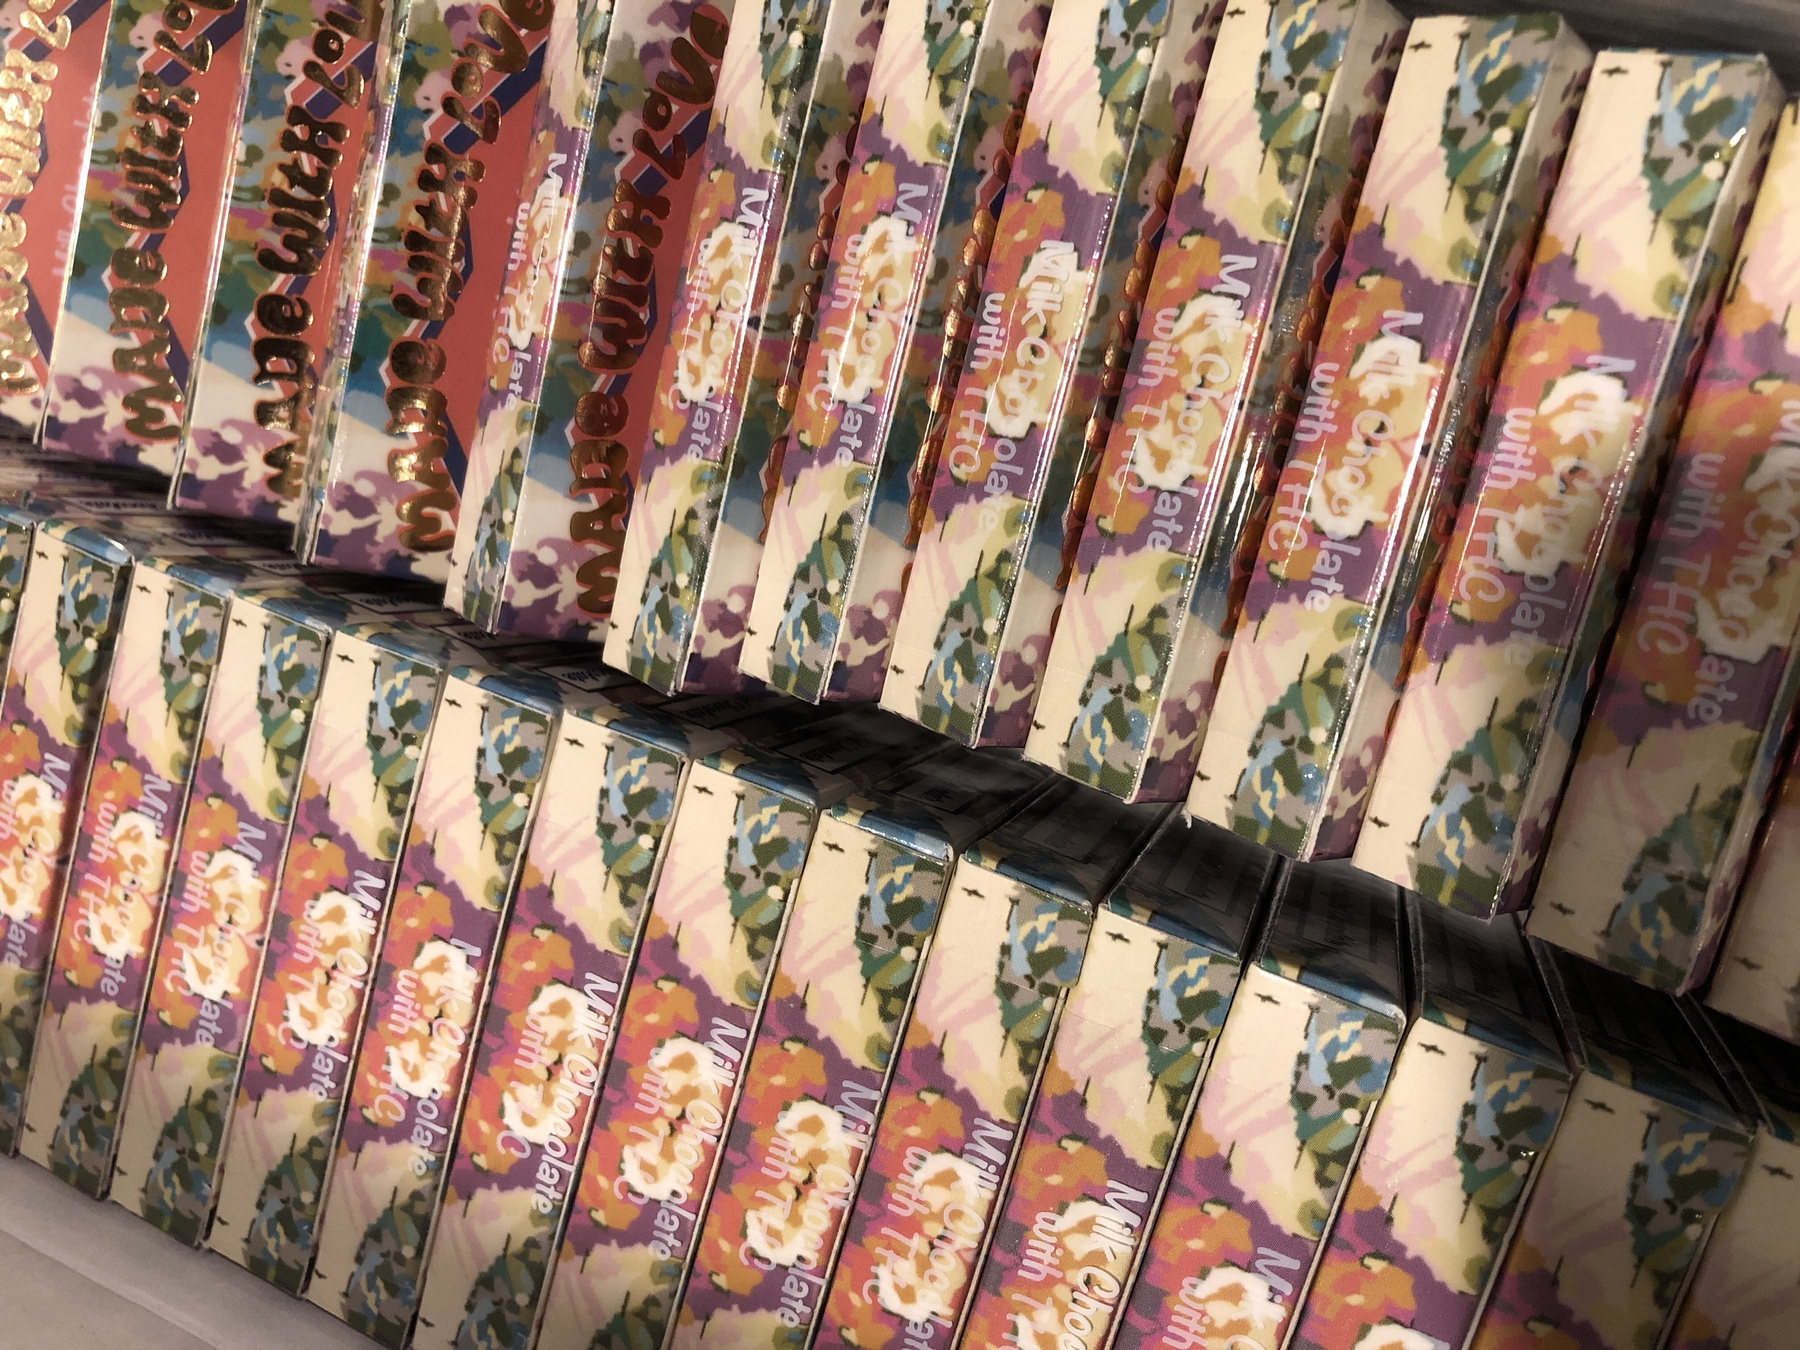 400 MG High Vibes Belgian Milk Chocolate Bar (25 mg x 16 pieces) Product image